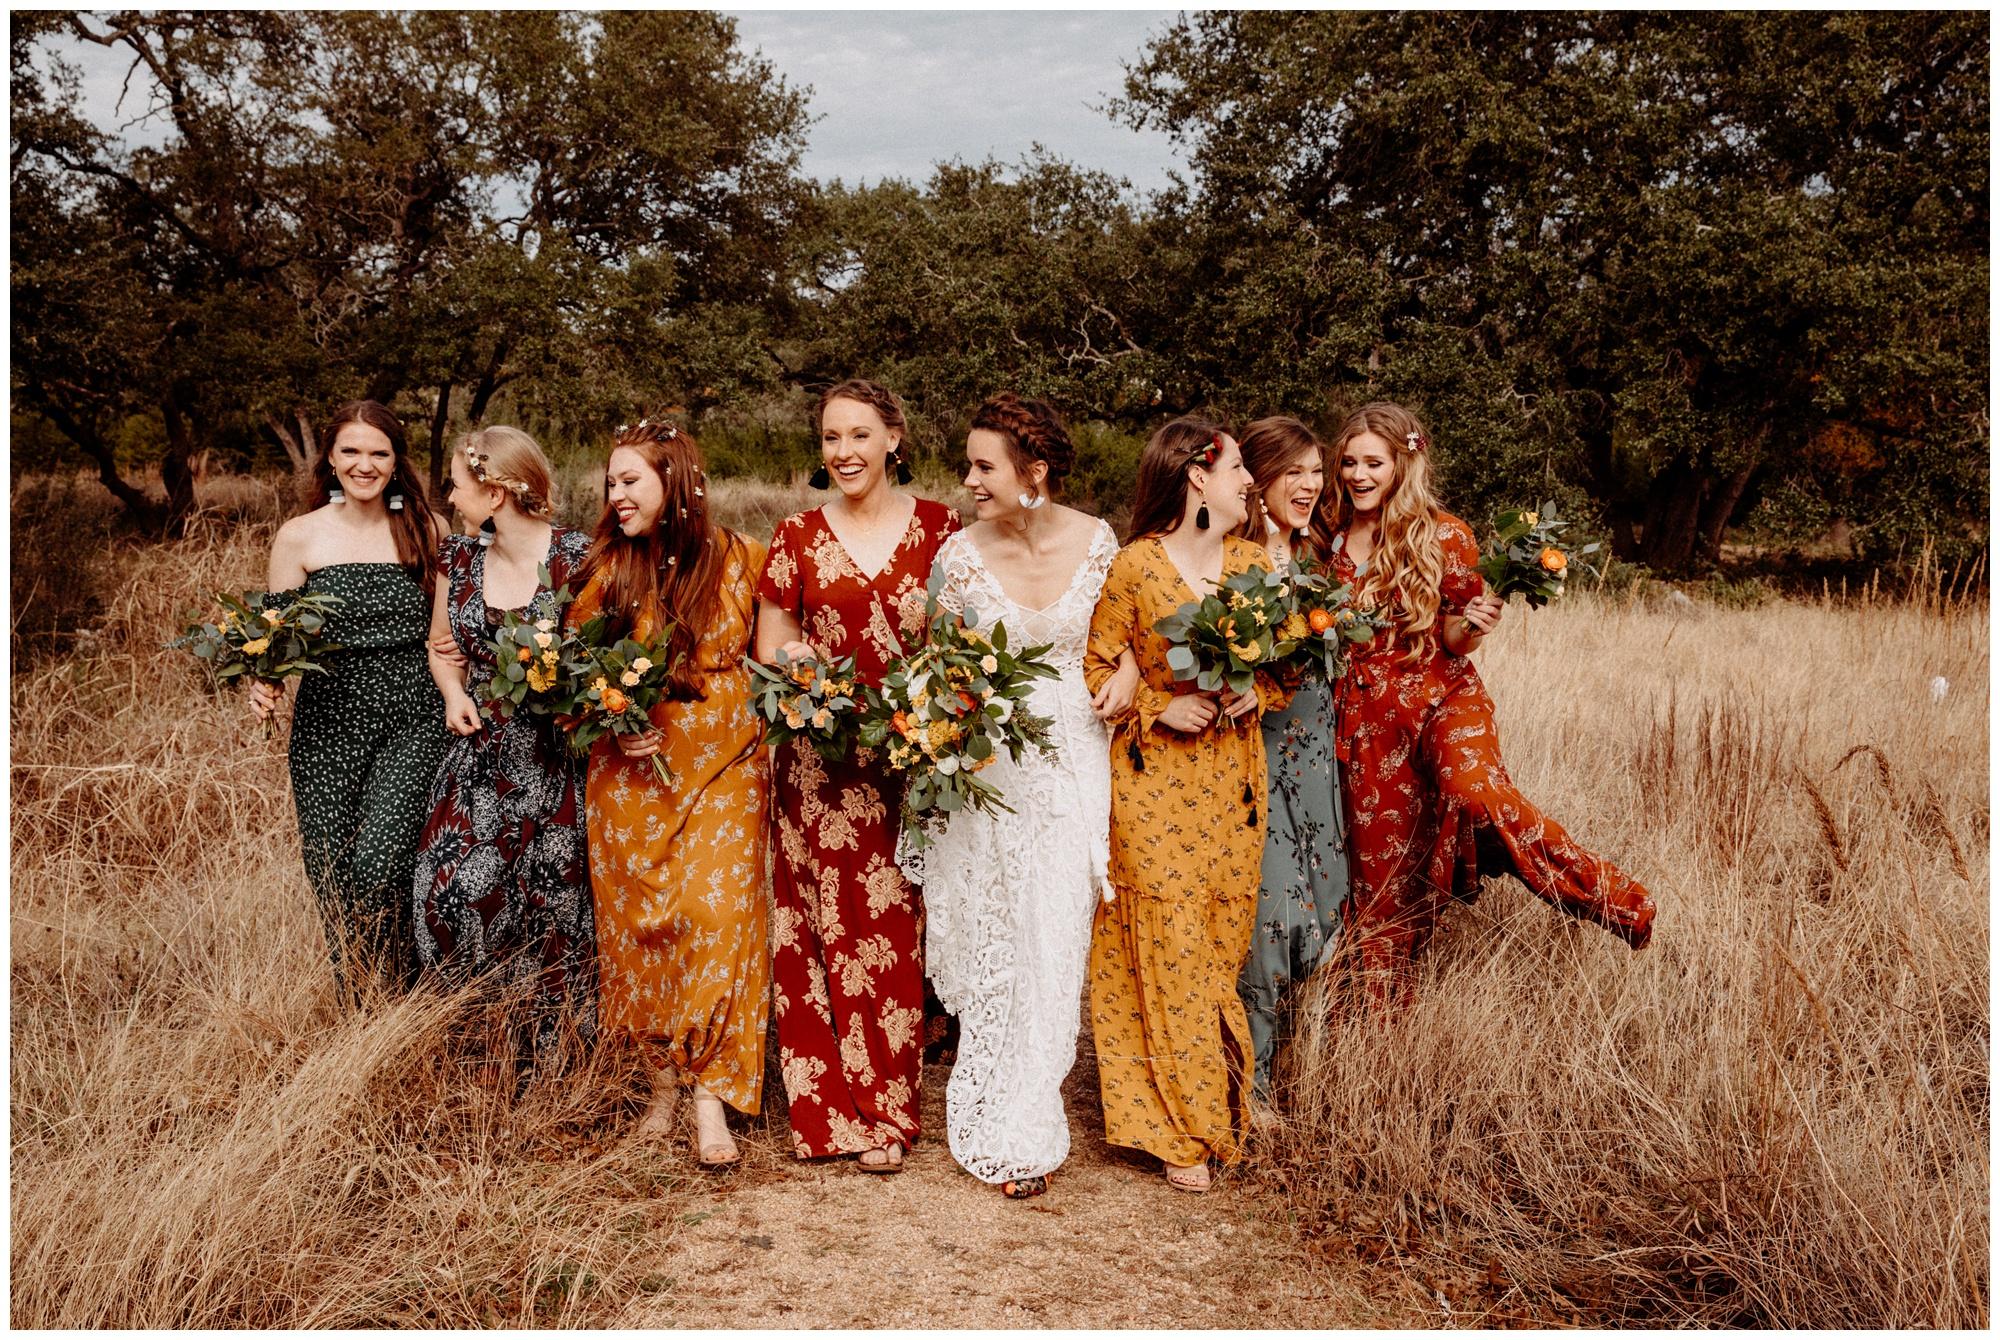 AUSTIN-TEXAS-PROSPECT-HOUSE-WEDDING-VENUE-PHOTOGRAPHY25757.JPG